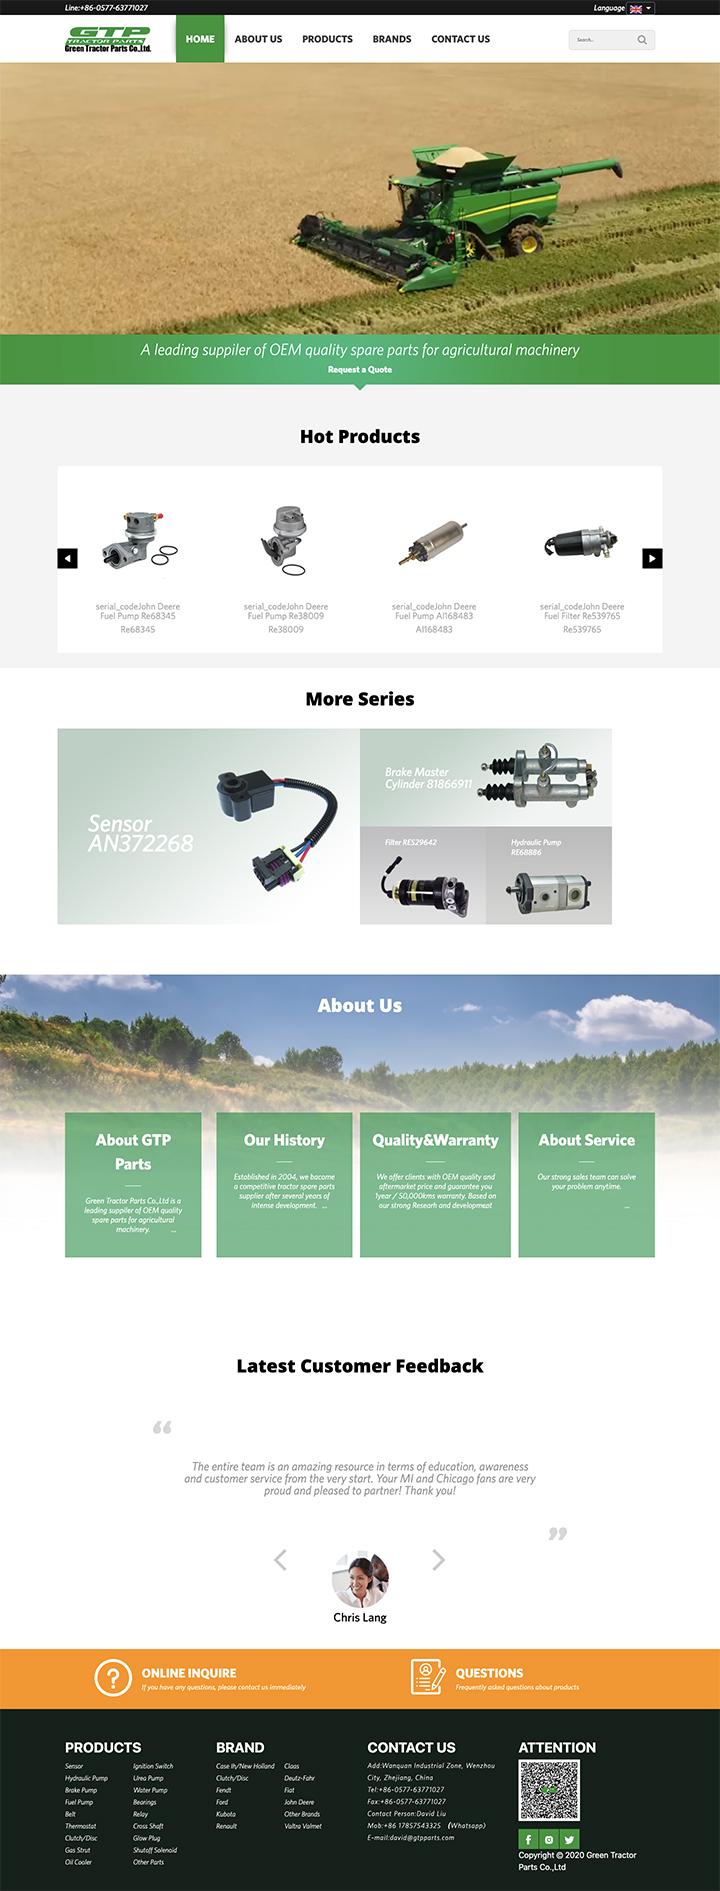 Green Tractor Parts Co.,Ltd